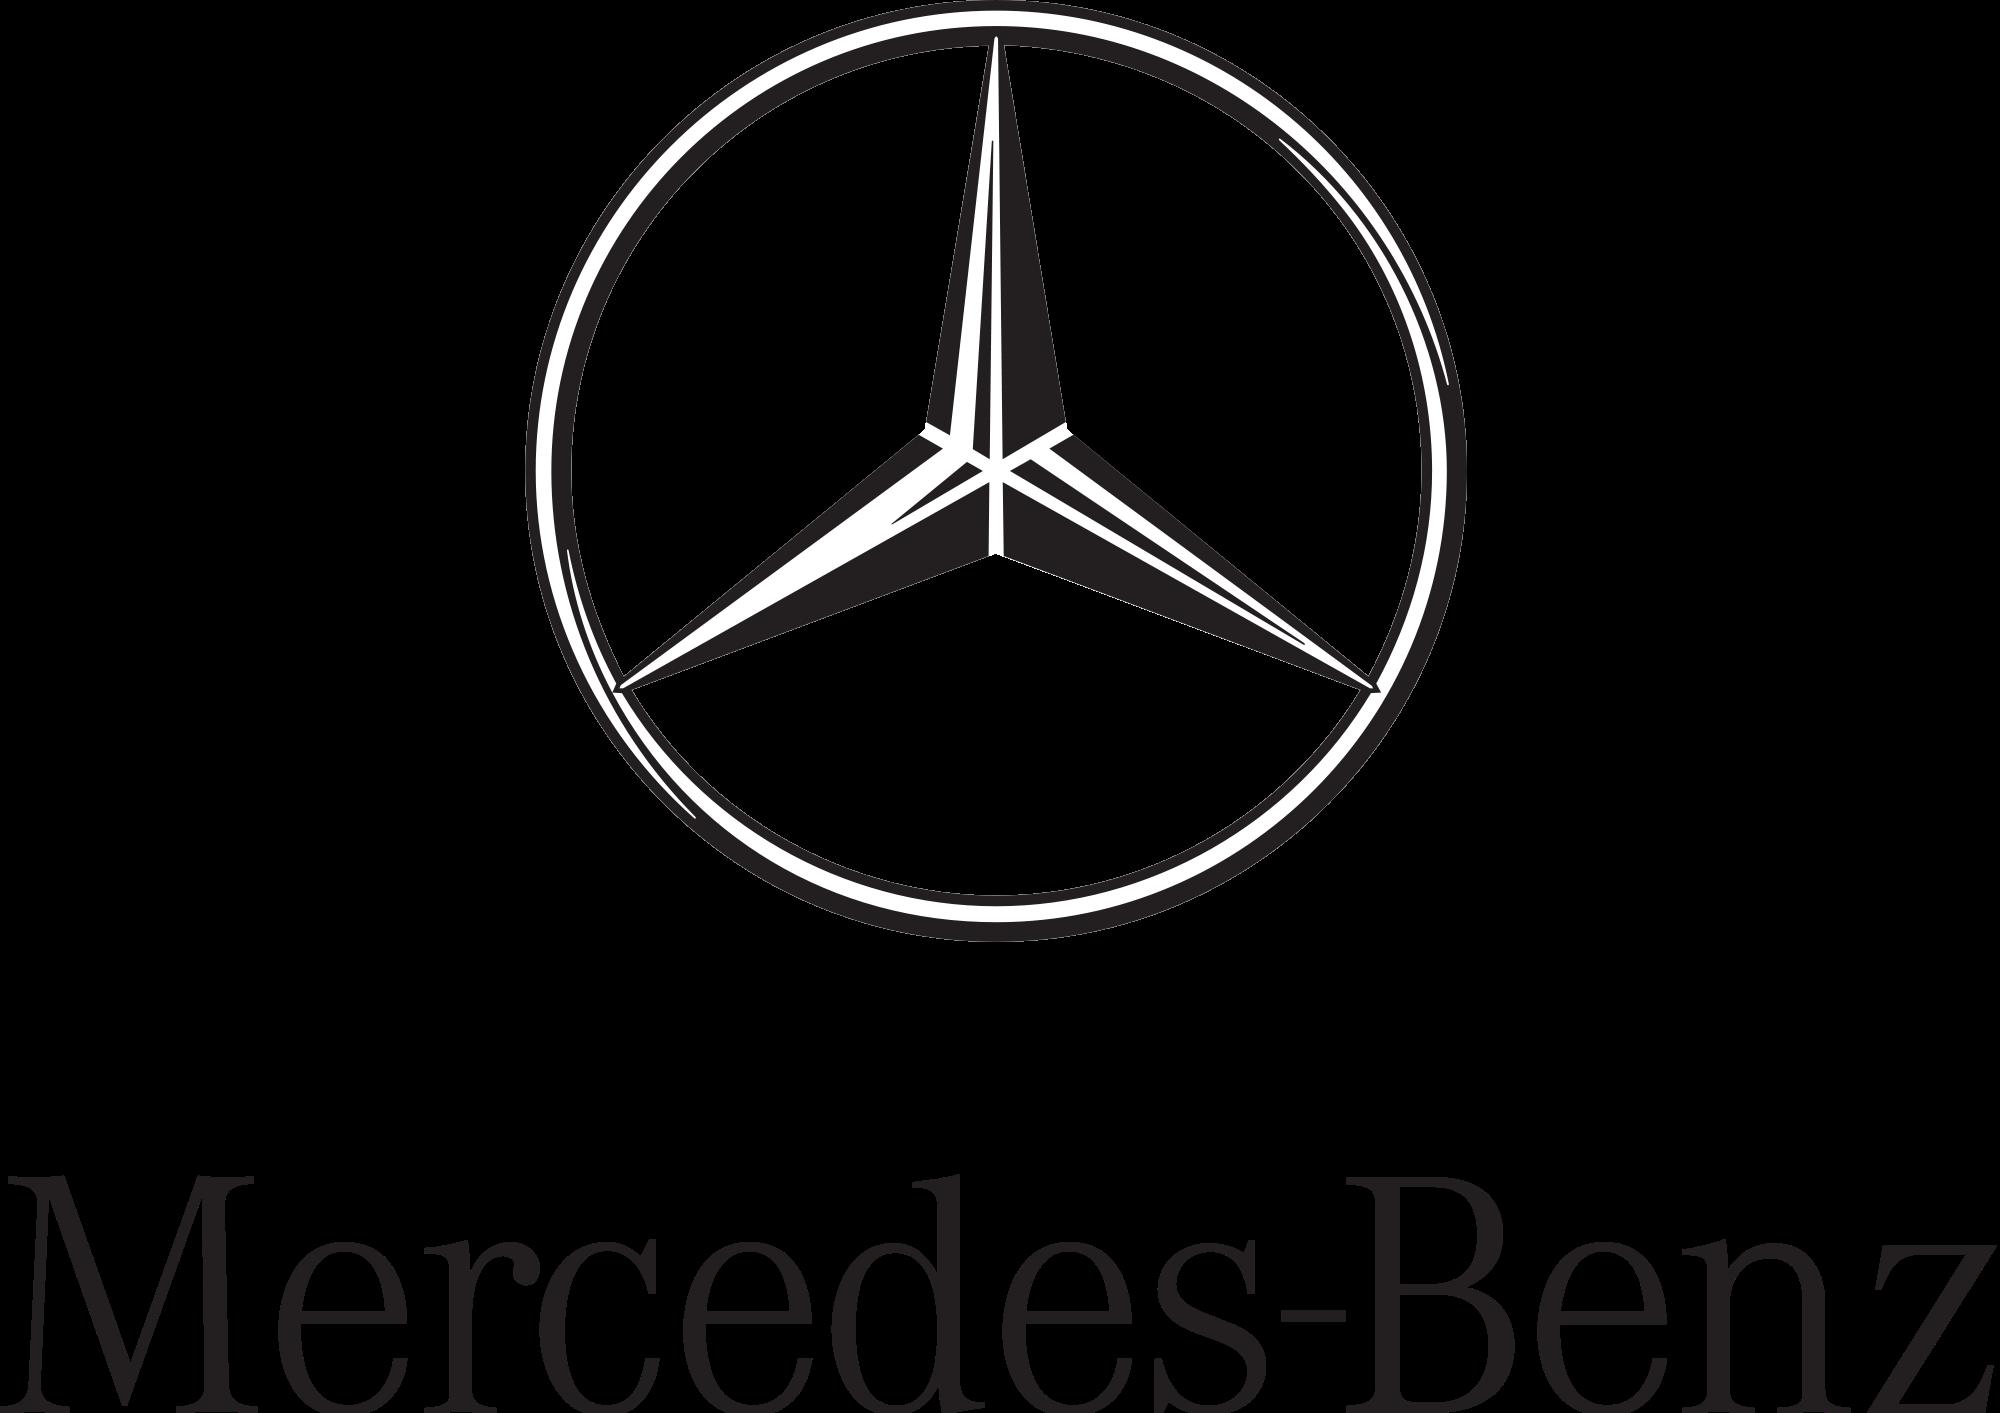 mercedes_logos_PNG11.png